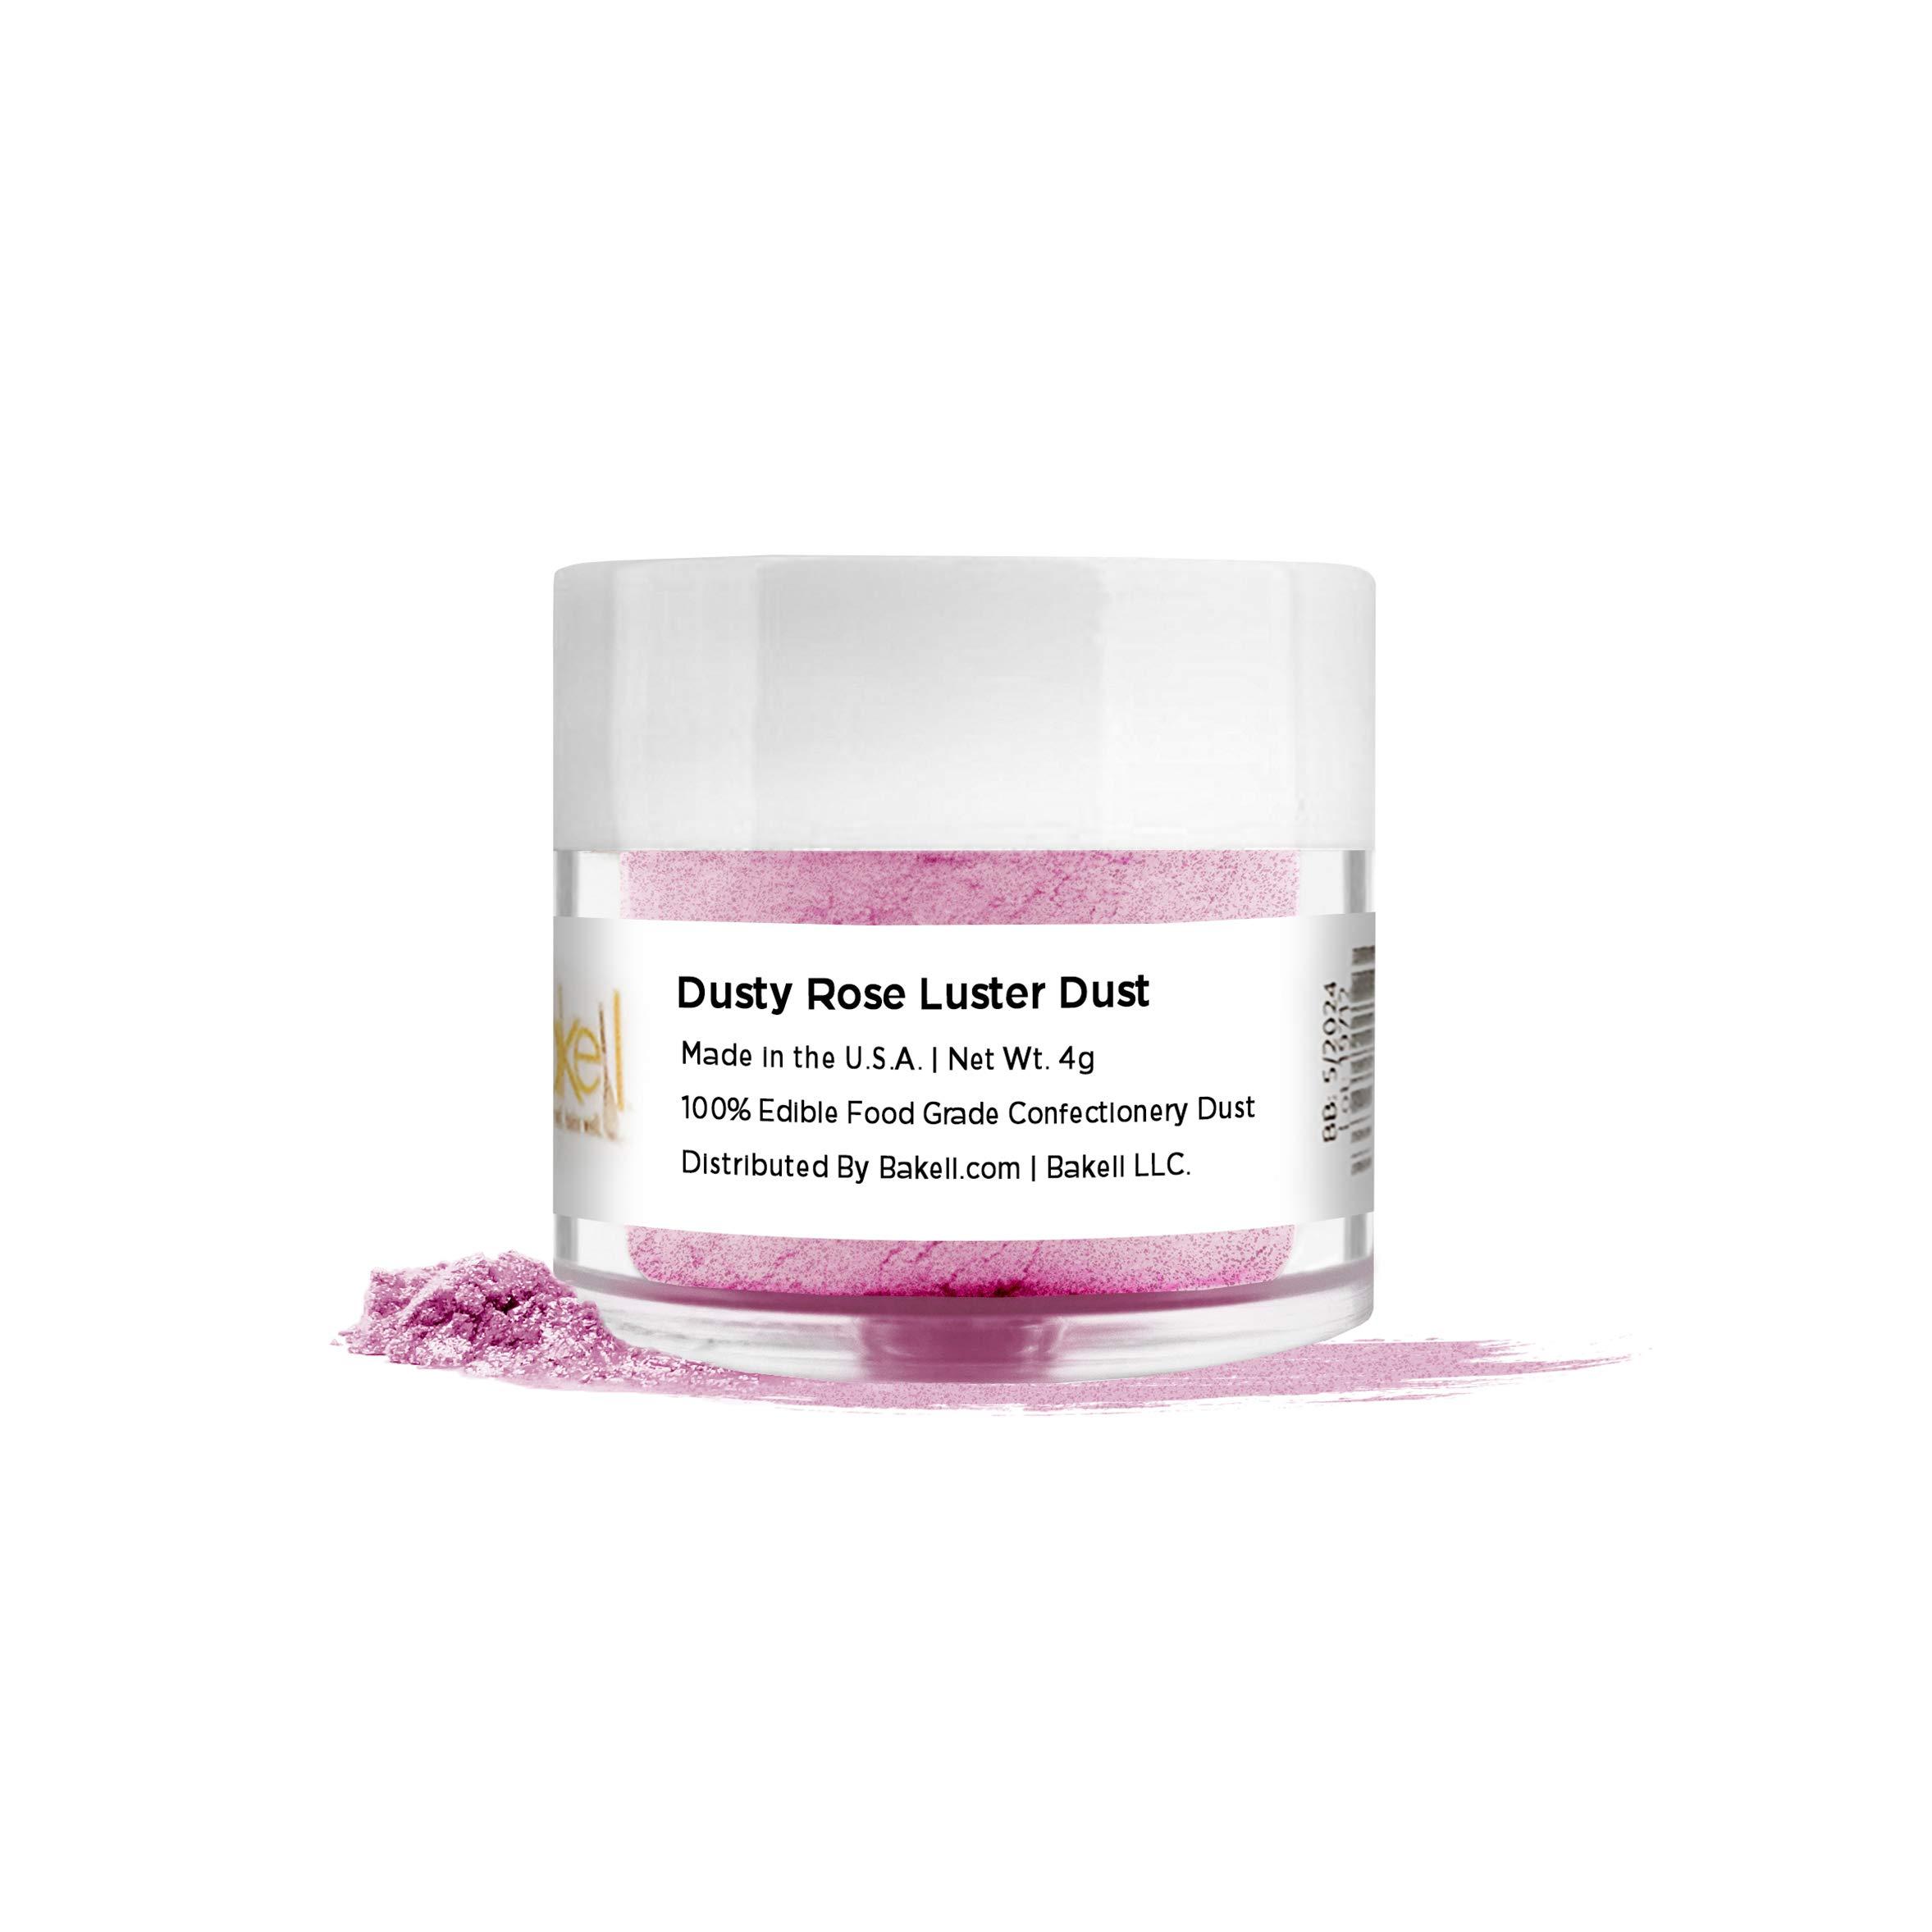 BAKELL Dusty Rose Edible Luster Dust & Paint, 4 Gram | LUSTER DUST Edible Powder | FDA Approved Paint, Powder & Dust | 100% Edible & Food Grade| Cakes, Cupcakes, Vegan Paint & Dust (Dusty Rose)